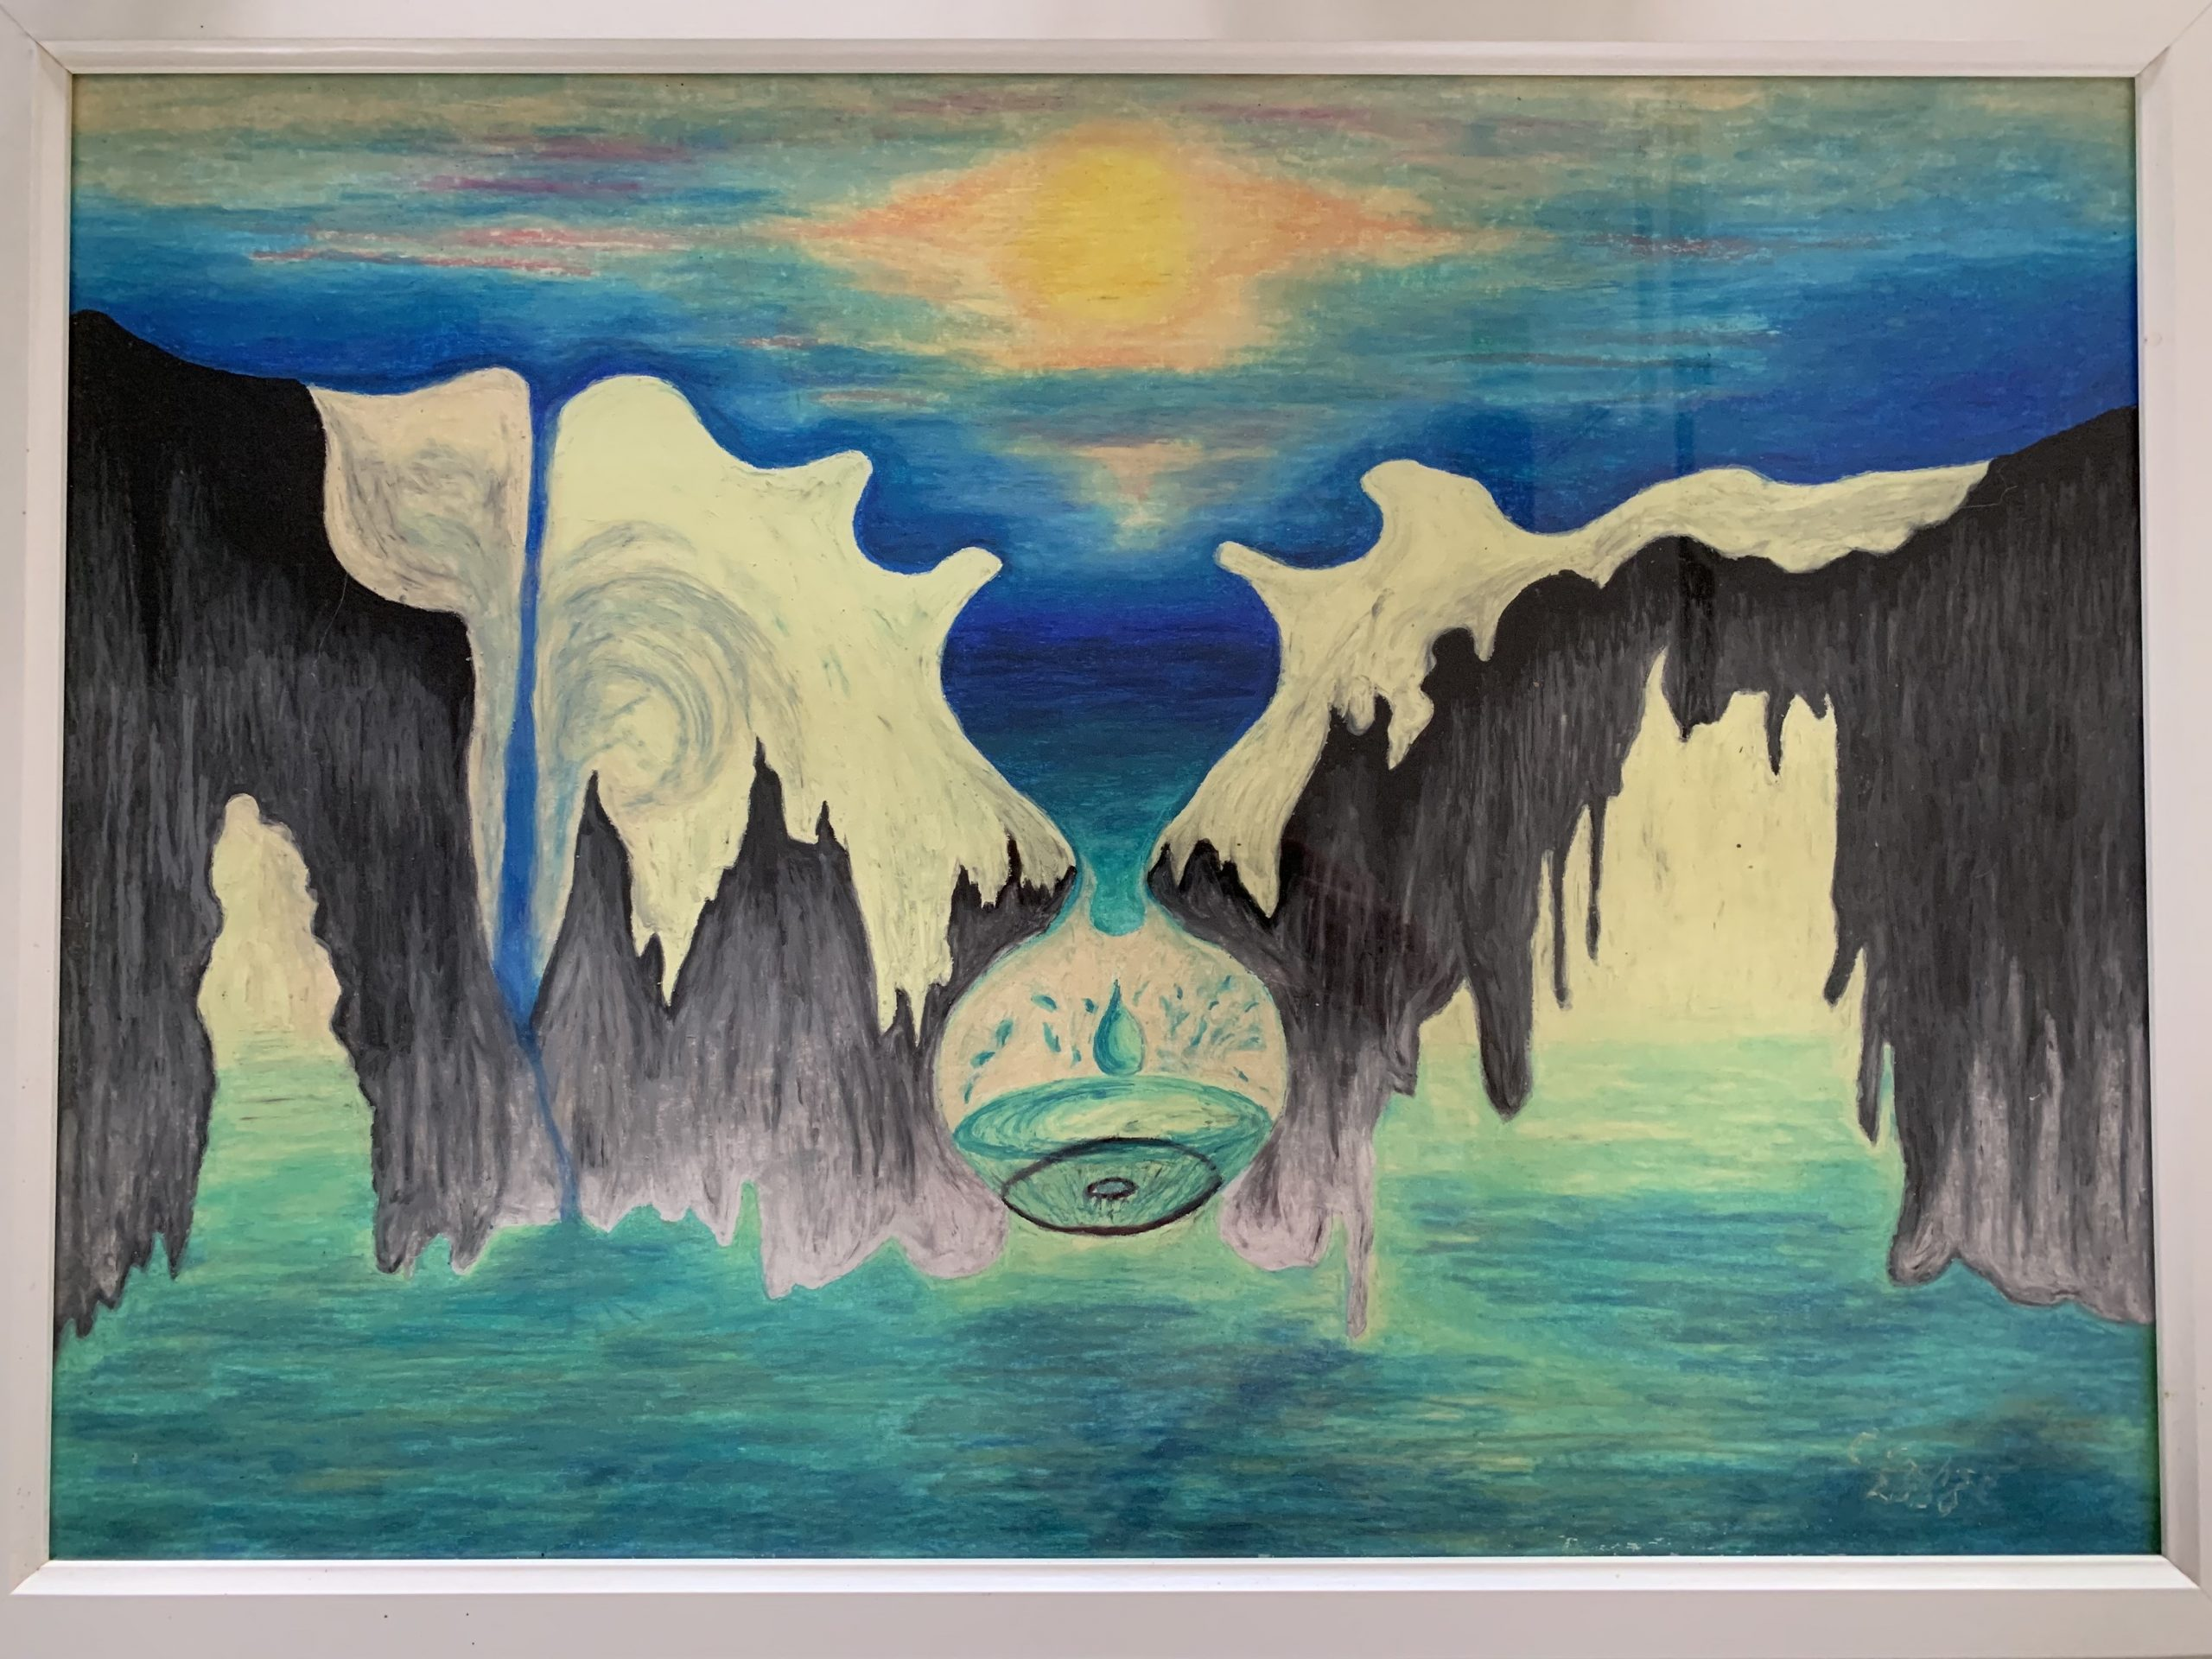 Waterworld 2000, Wachsmalkreide, wax crayon on paper